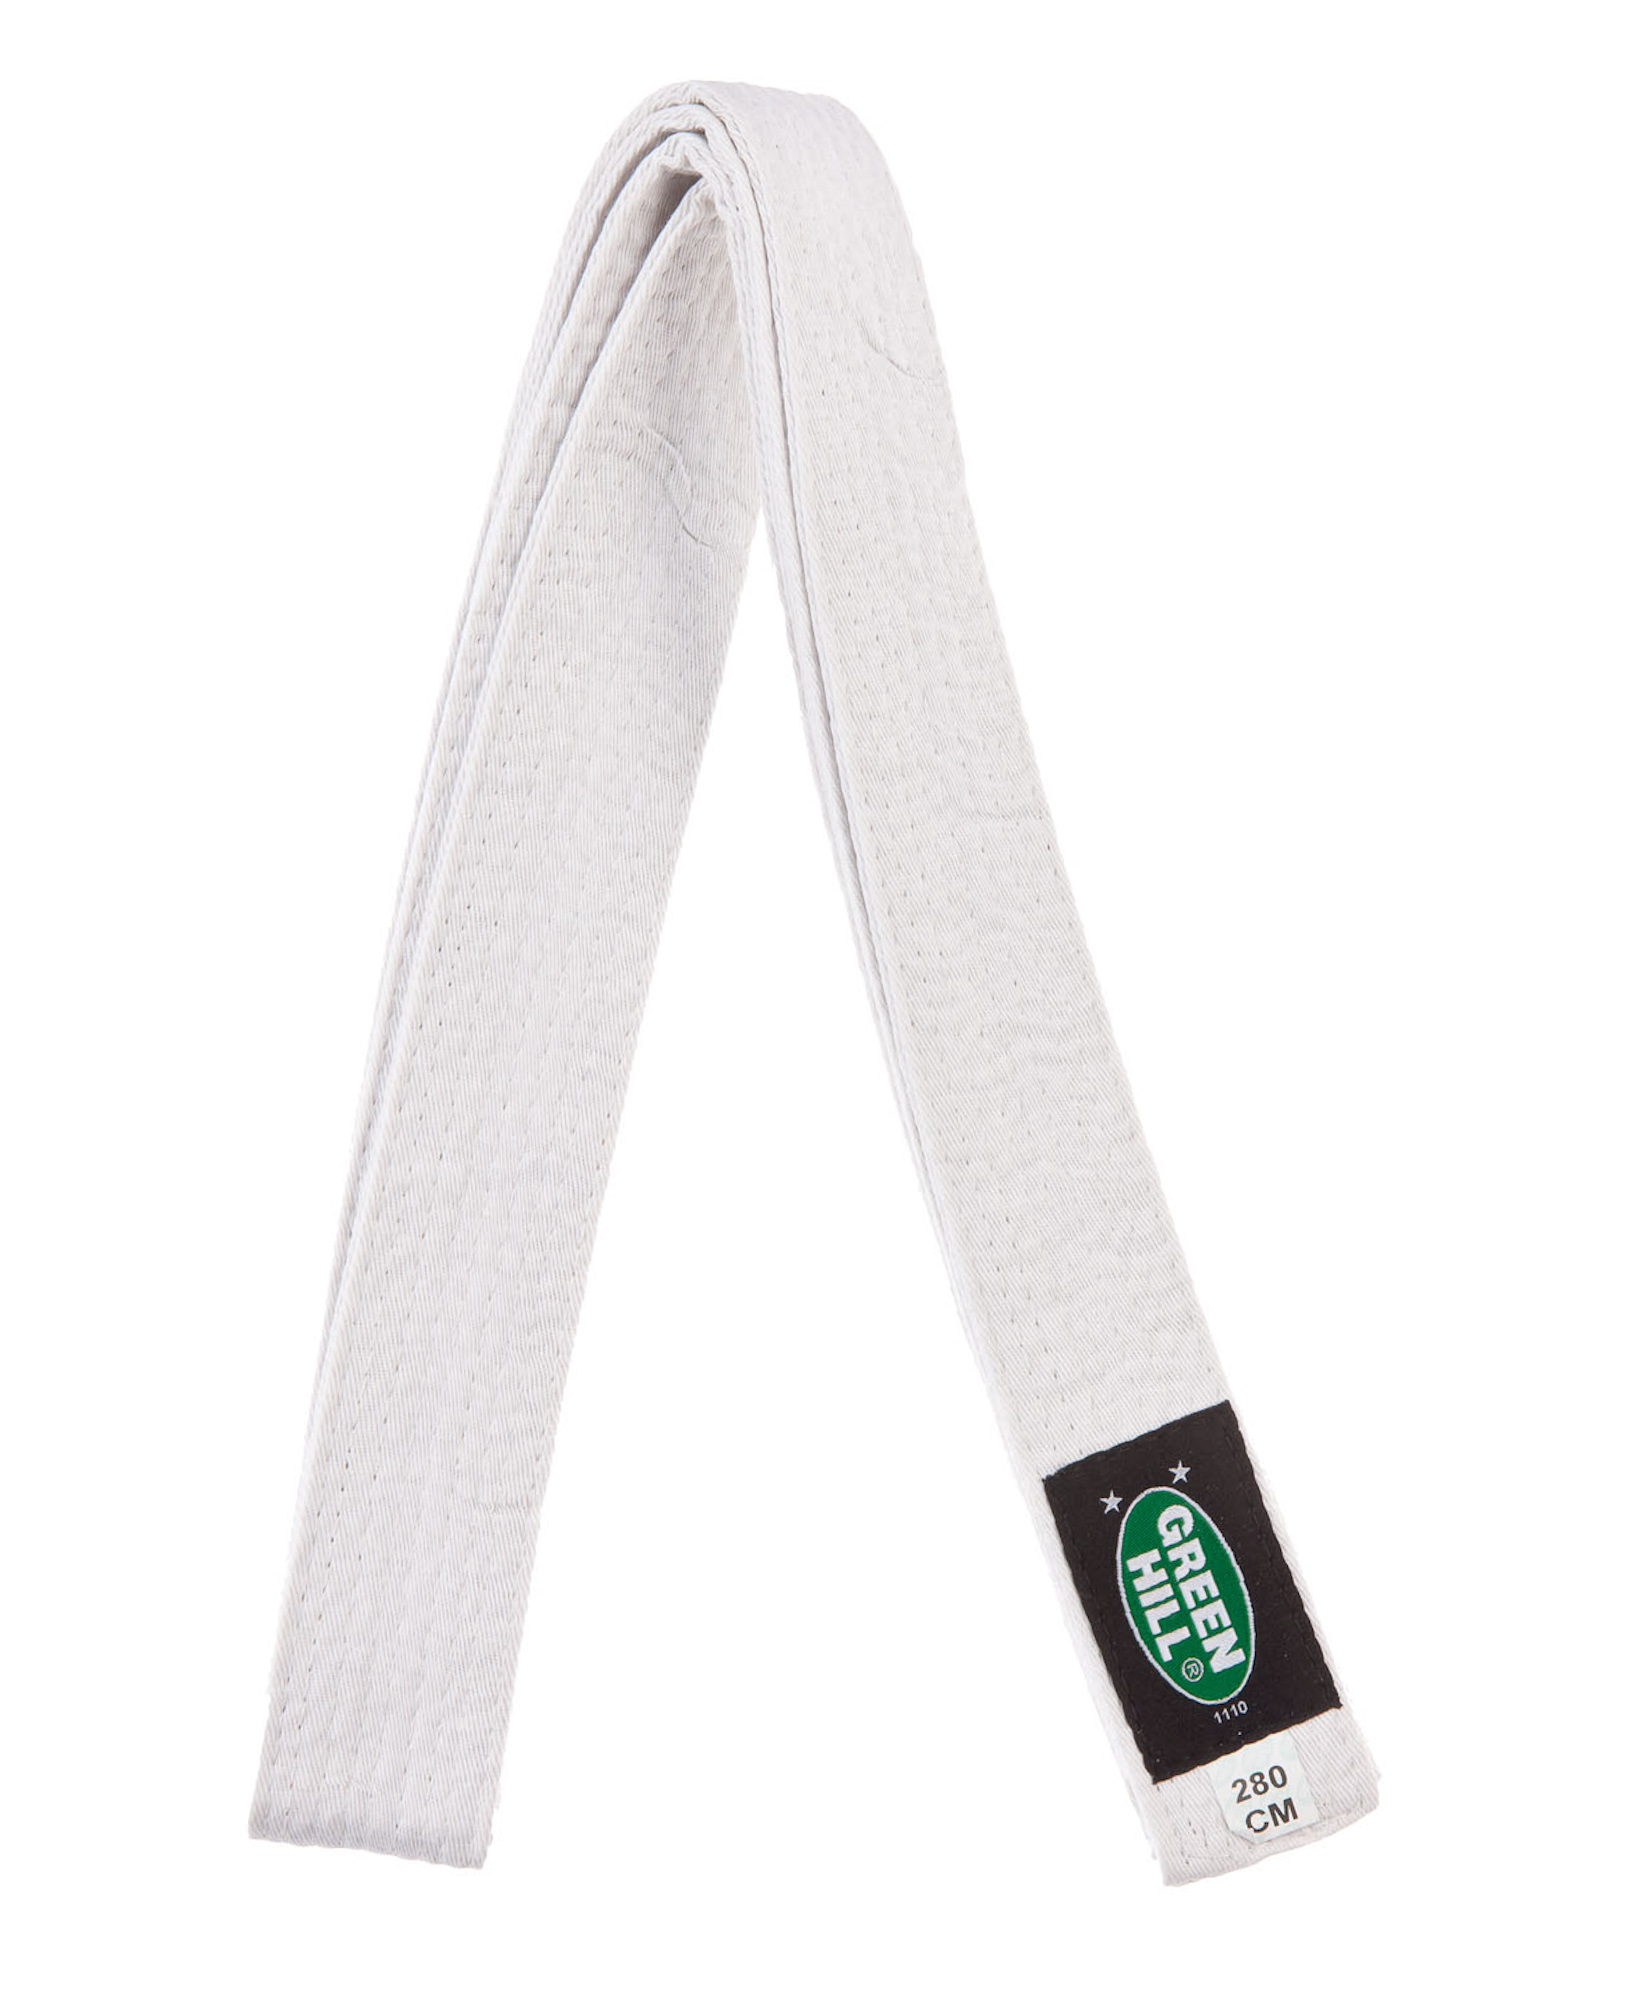 Green Hill Пояс для кимоно Green Hill, 280 см, размер 280 см цена